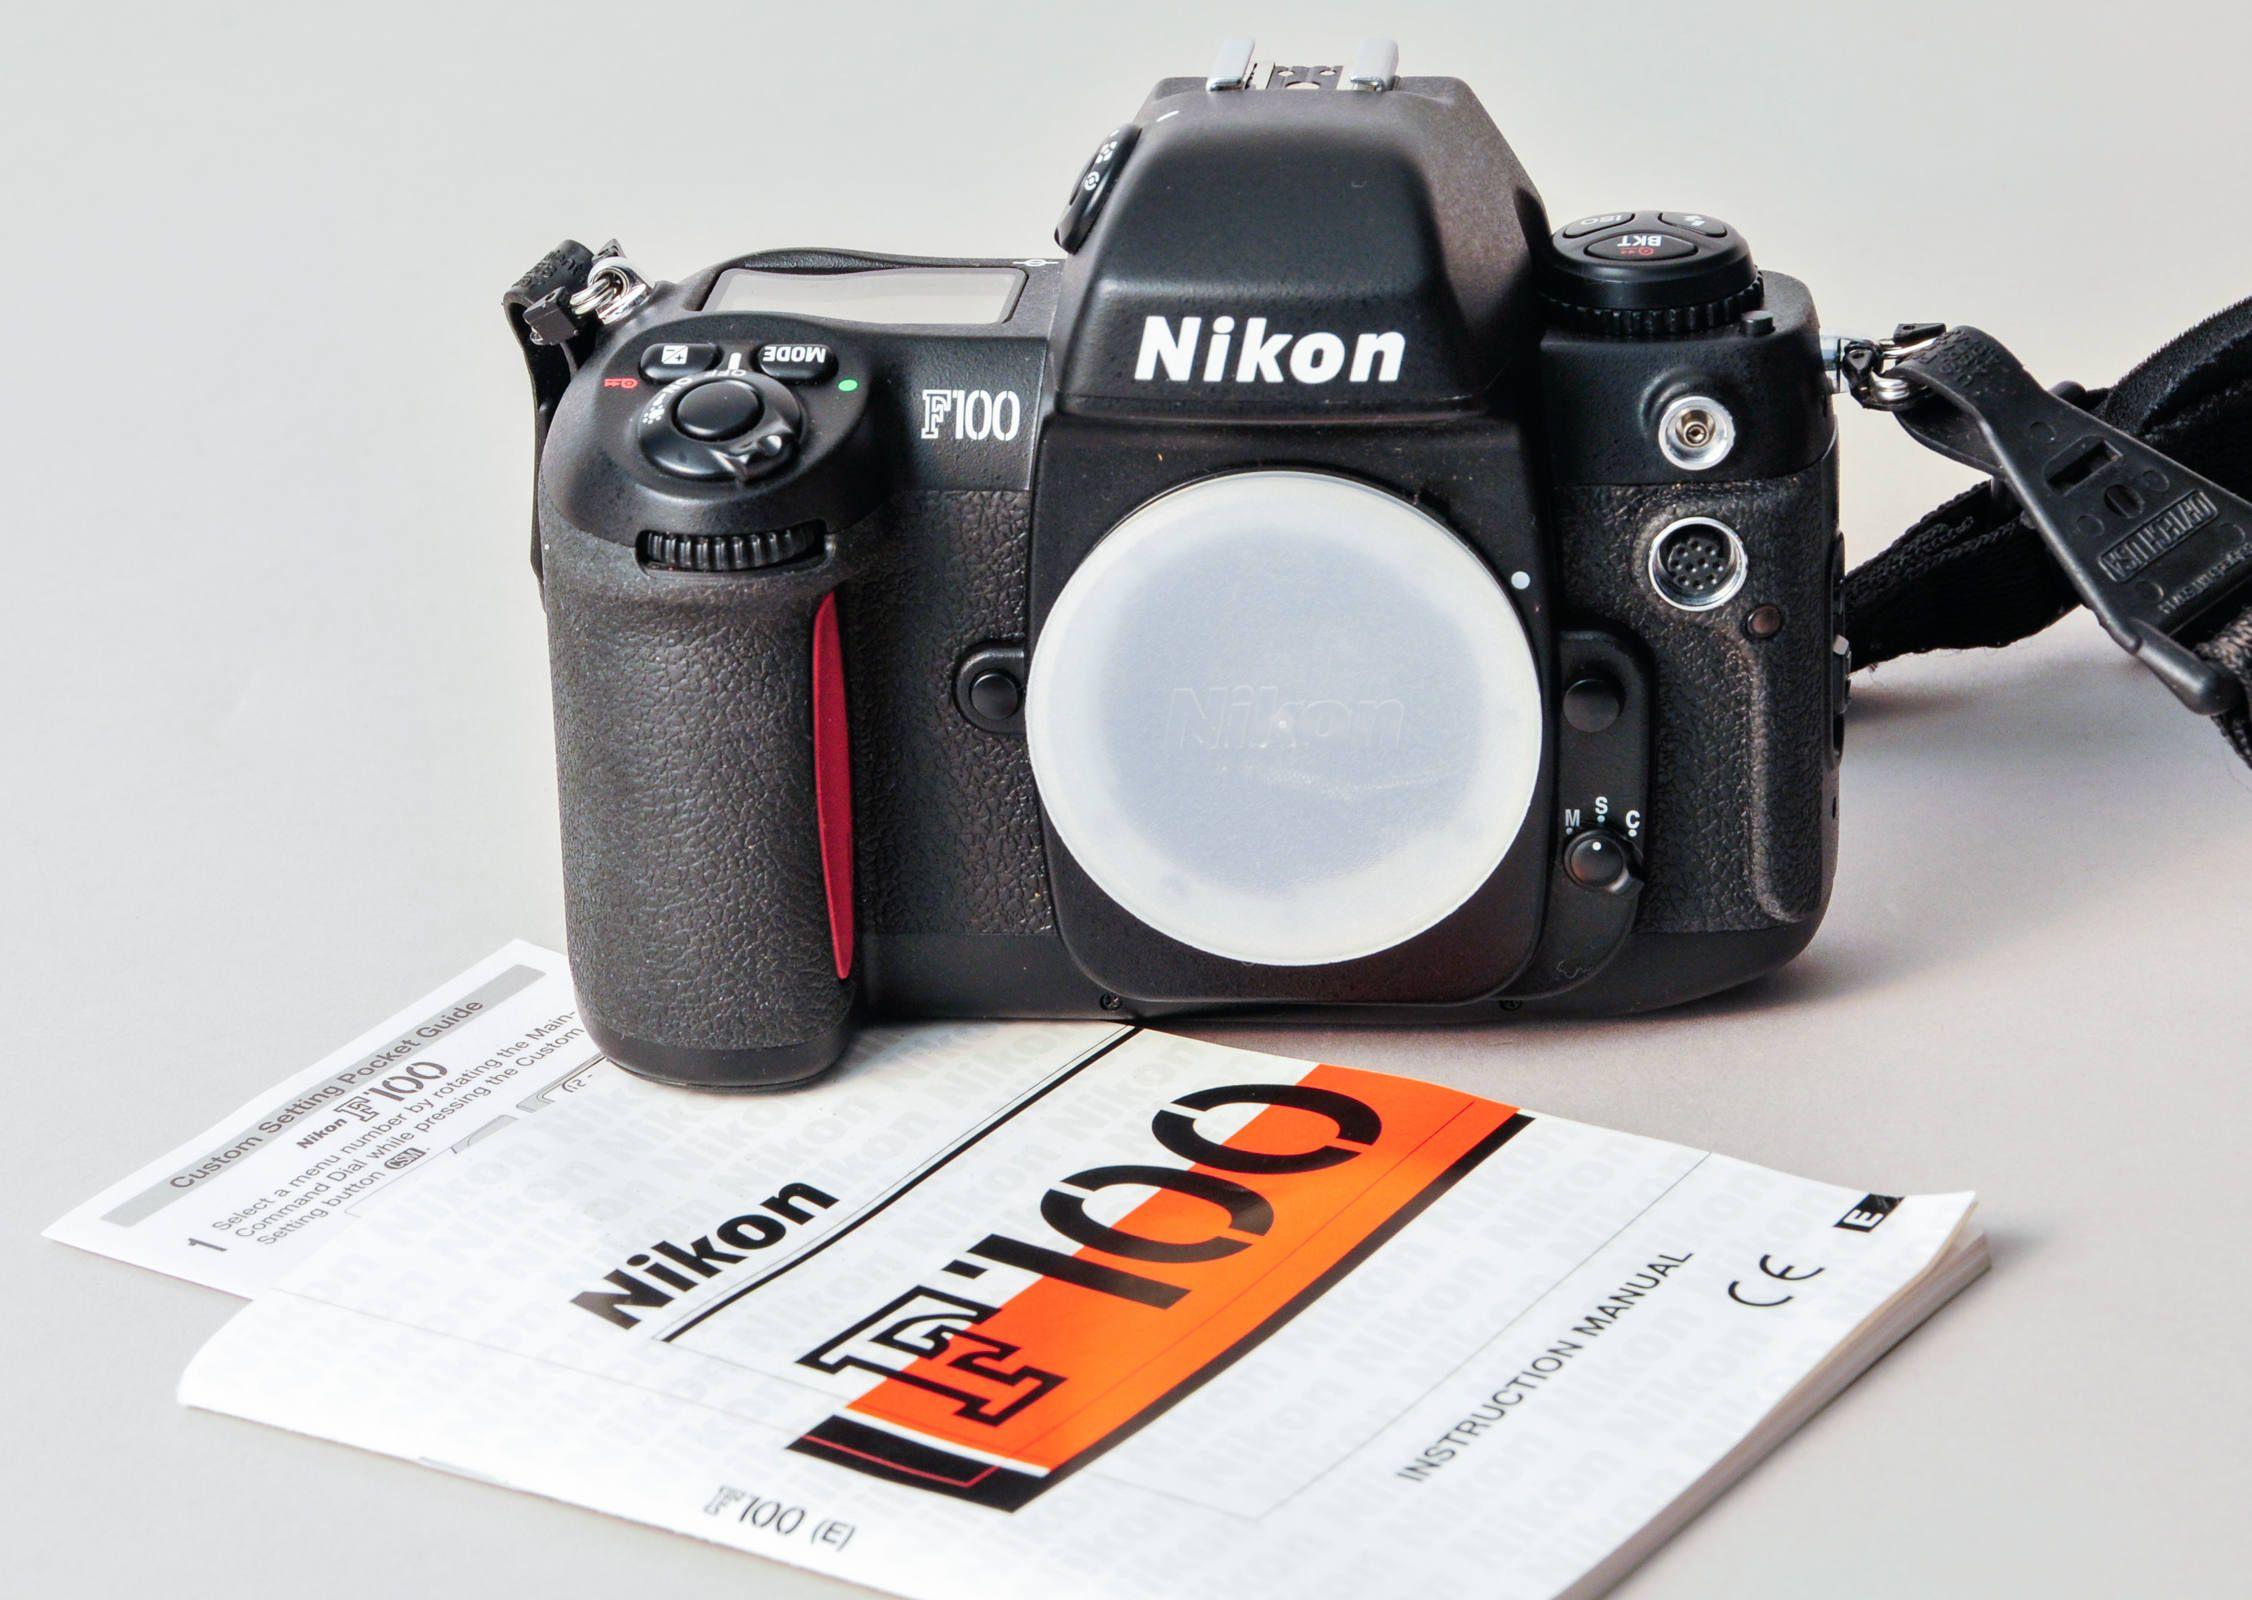 nikon f100 camera body automatic 35mm instructions excellent rh pinterest com Nikon F1 nikon f100 user manual